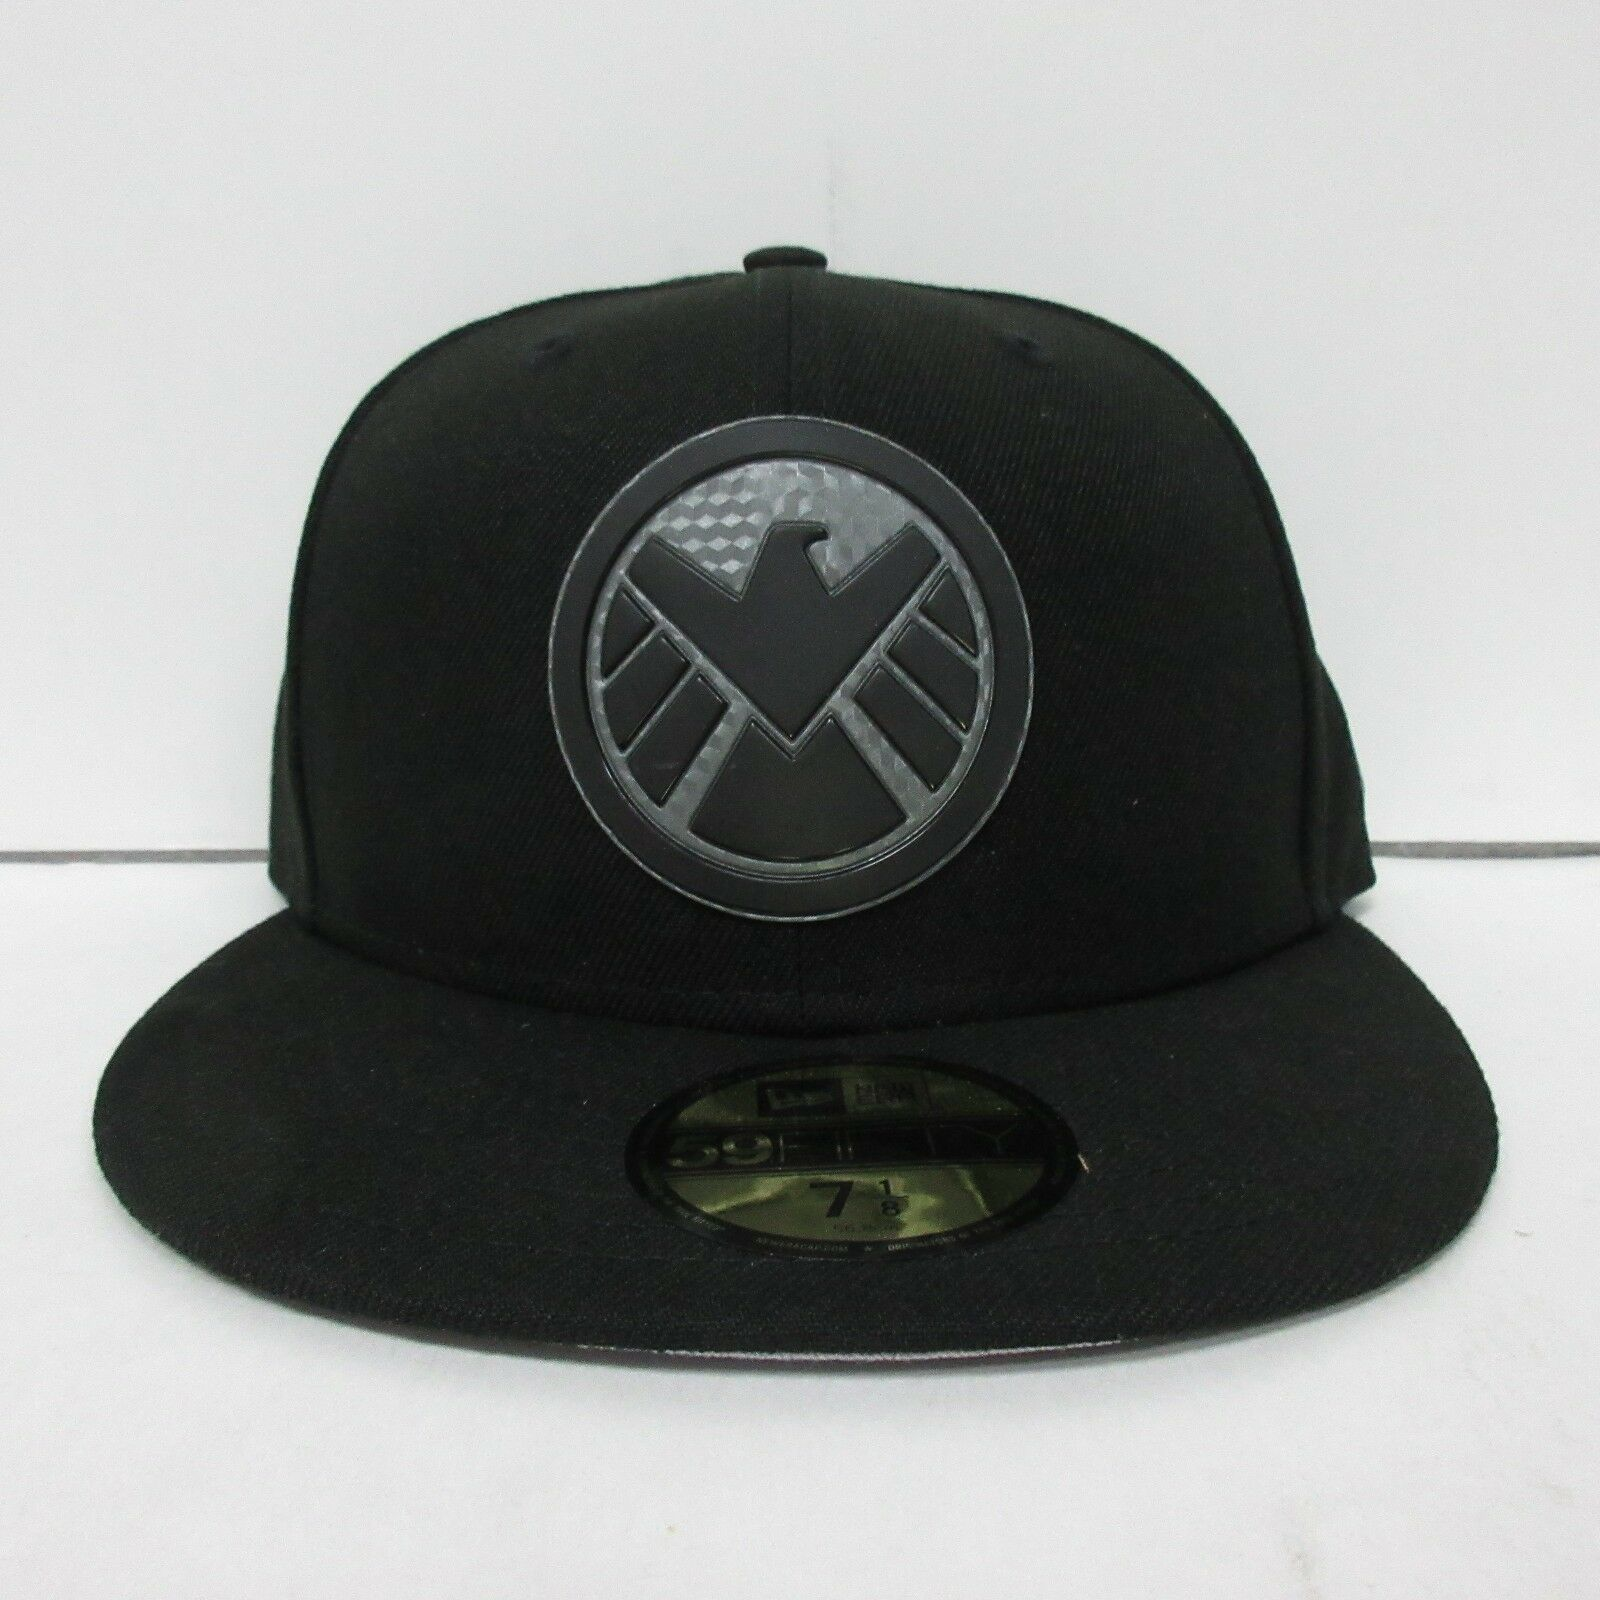 Marvel SHIELD Logo PX Hexshine New 5950 Era 5950 New Fitted Hats 7 1/2 1/4 1/8 3/8 5/8 ec0eb8